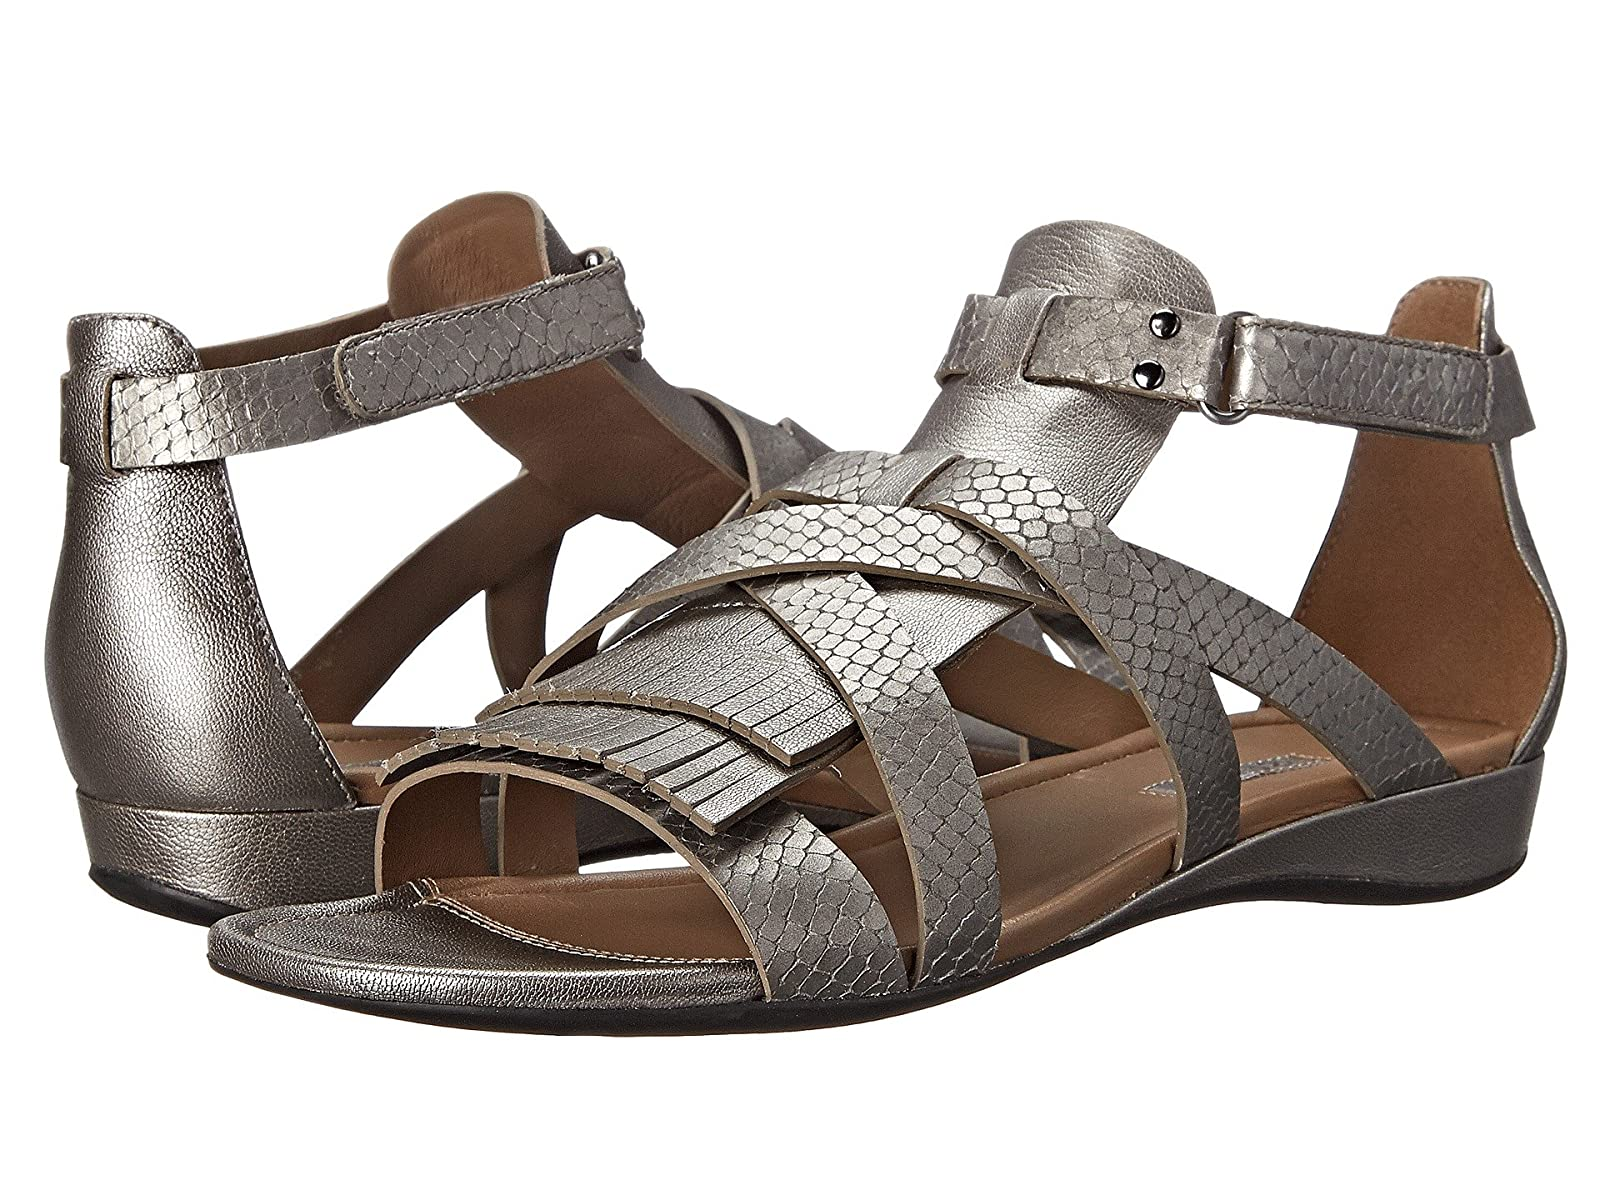 ECCO Bouillion Sandal II GladiatorCheap and distinctive eye-catching shoes